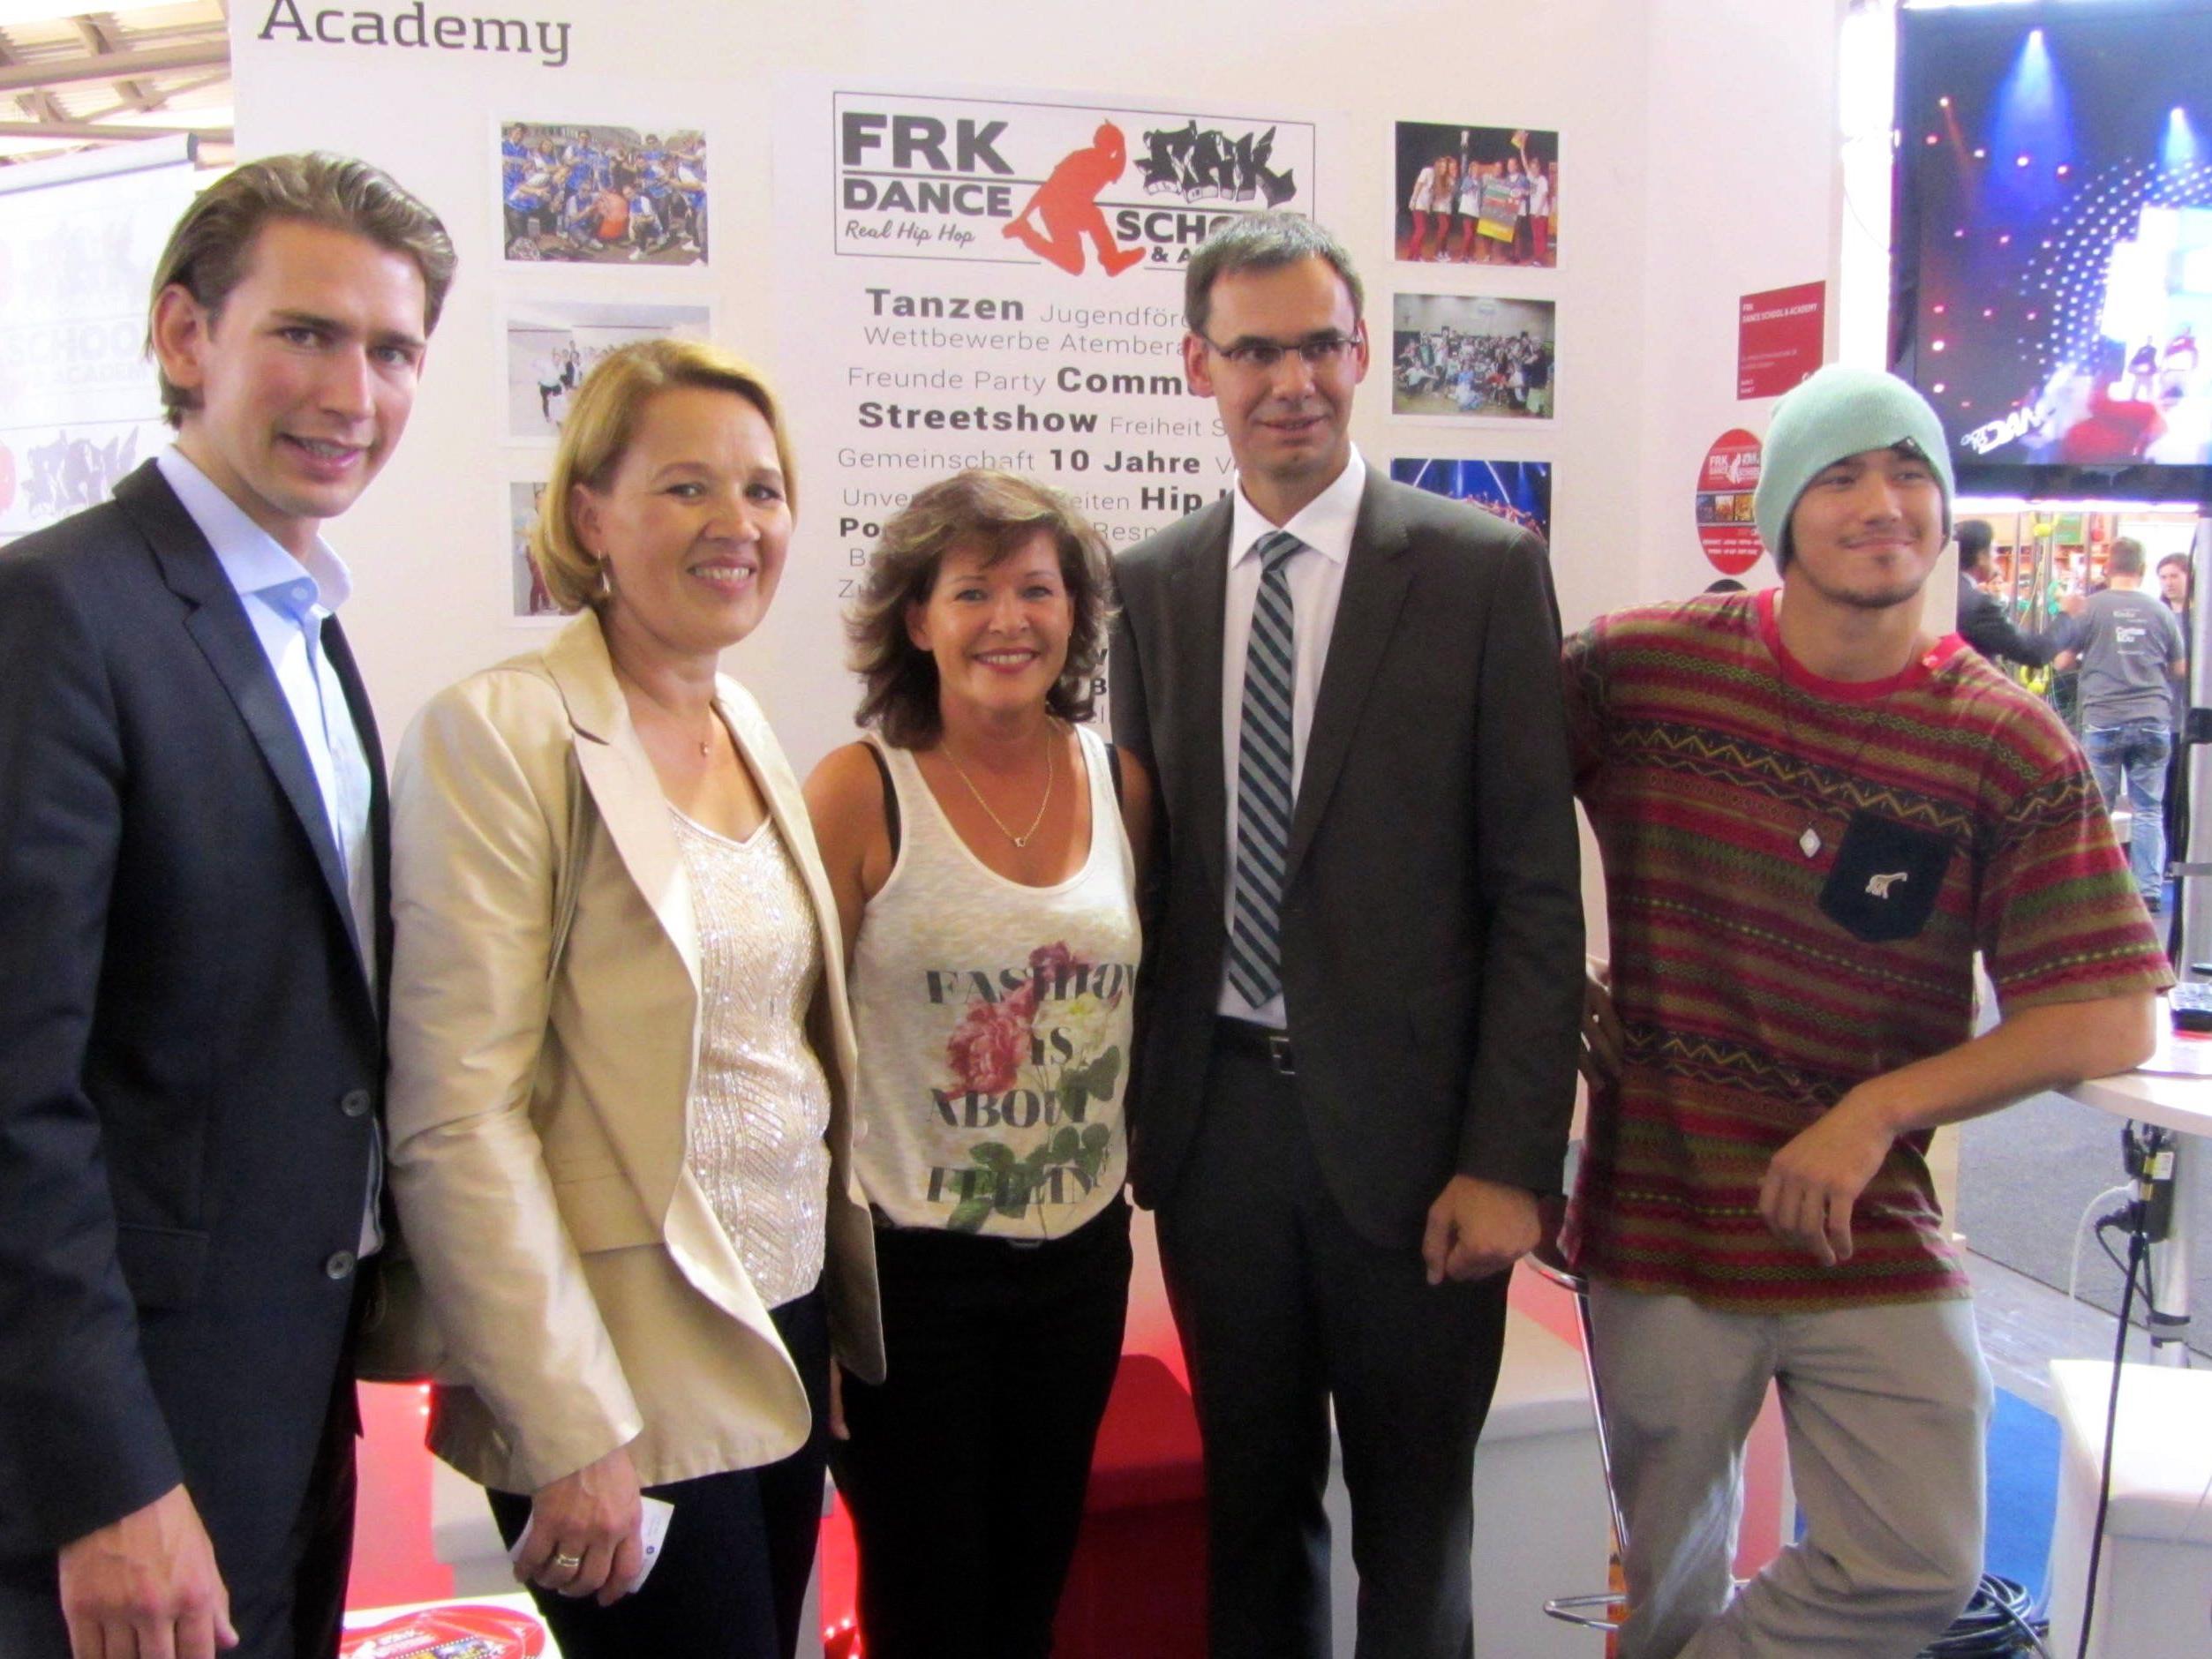 Hoher Besuch beim Messestand der FRK Dance School Dornbirn - Außenminister Sebastian Kurz, Bgm. Andrea Kaufmann, Ingeborg Peter (FRK), Landeshauptmann Wallner, Parick Gutensohn (FRK).